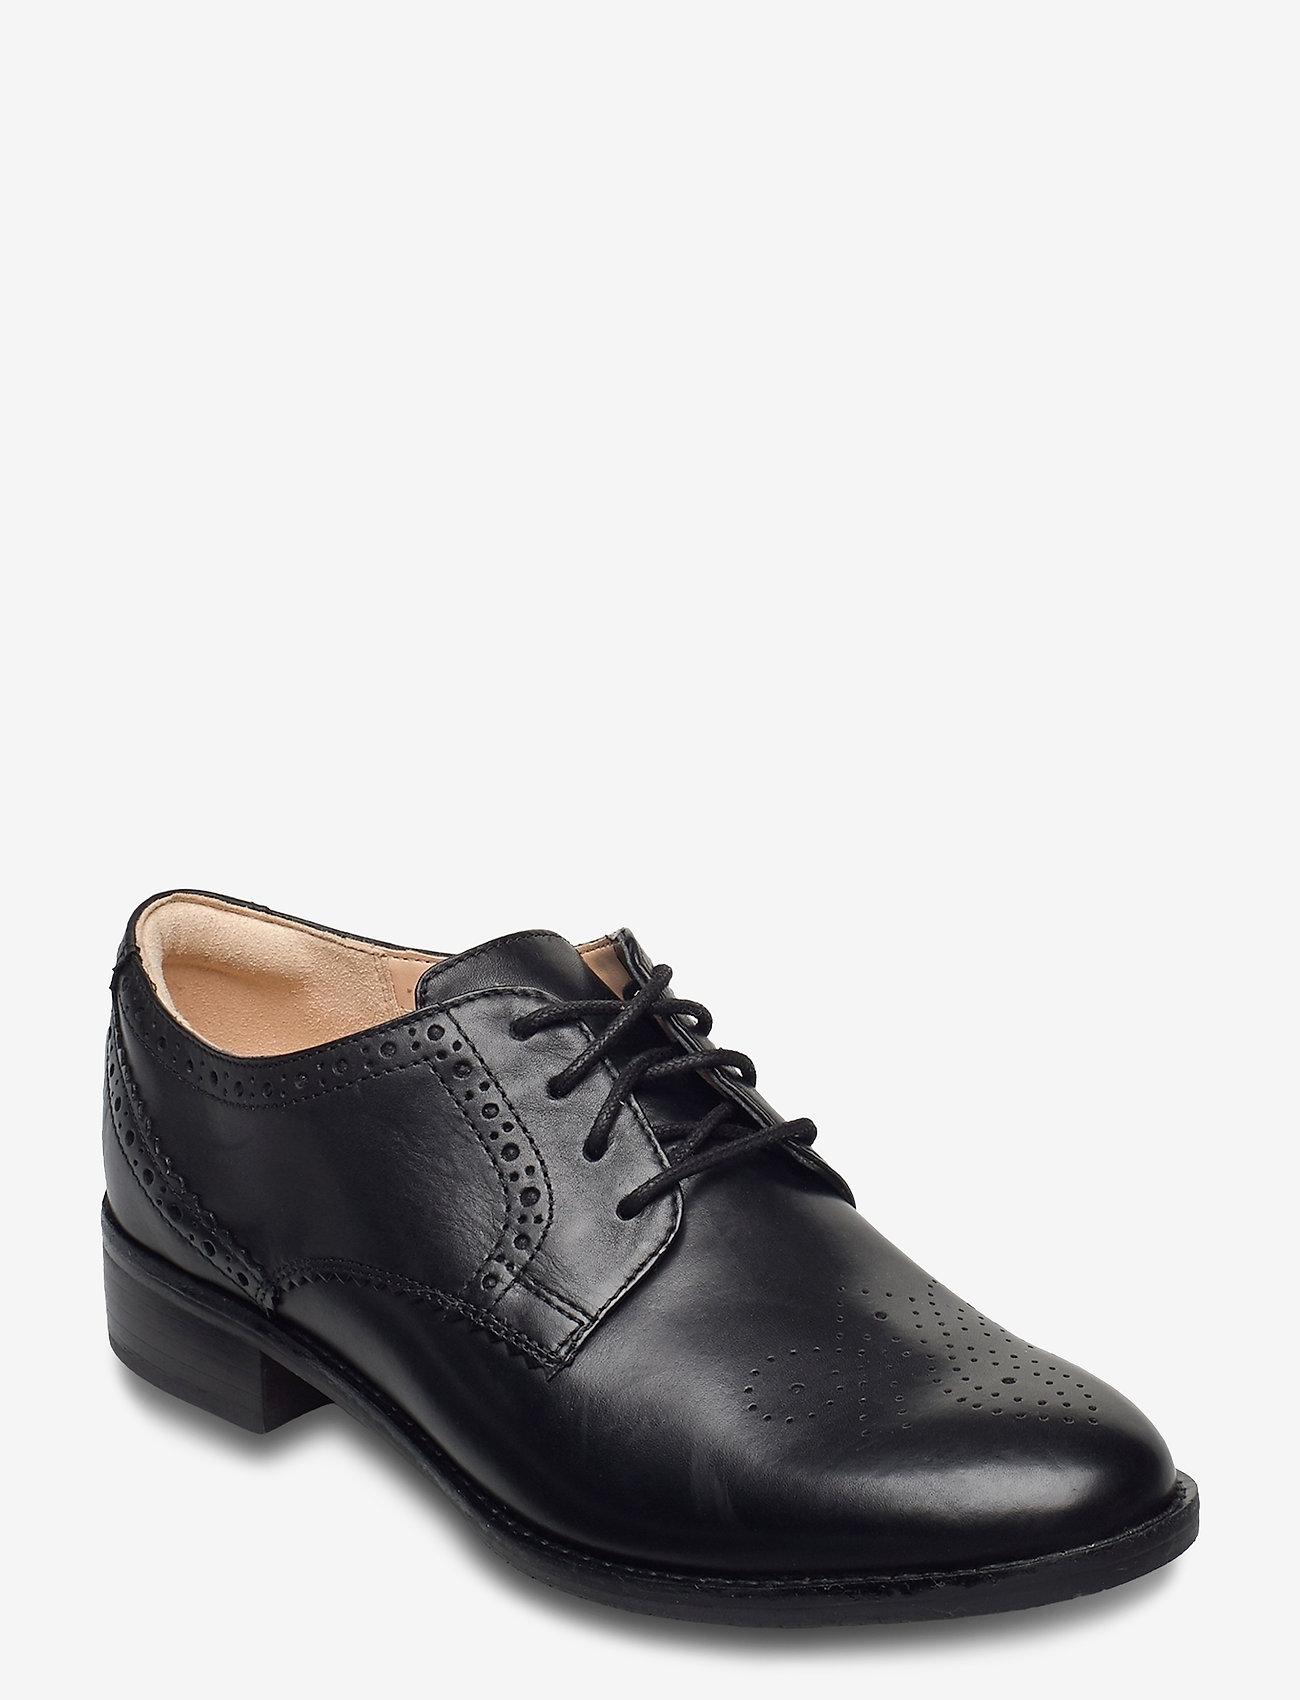 Clarks - Netley Rose - schnürschuhe - black leather - 0